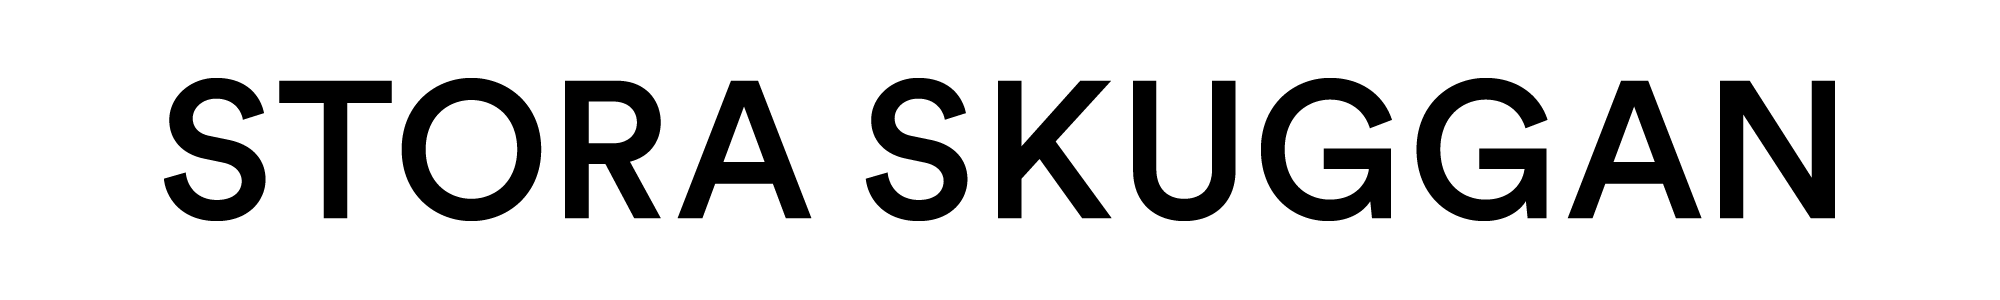 STSK_logotype.png